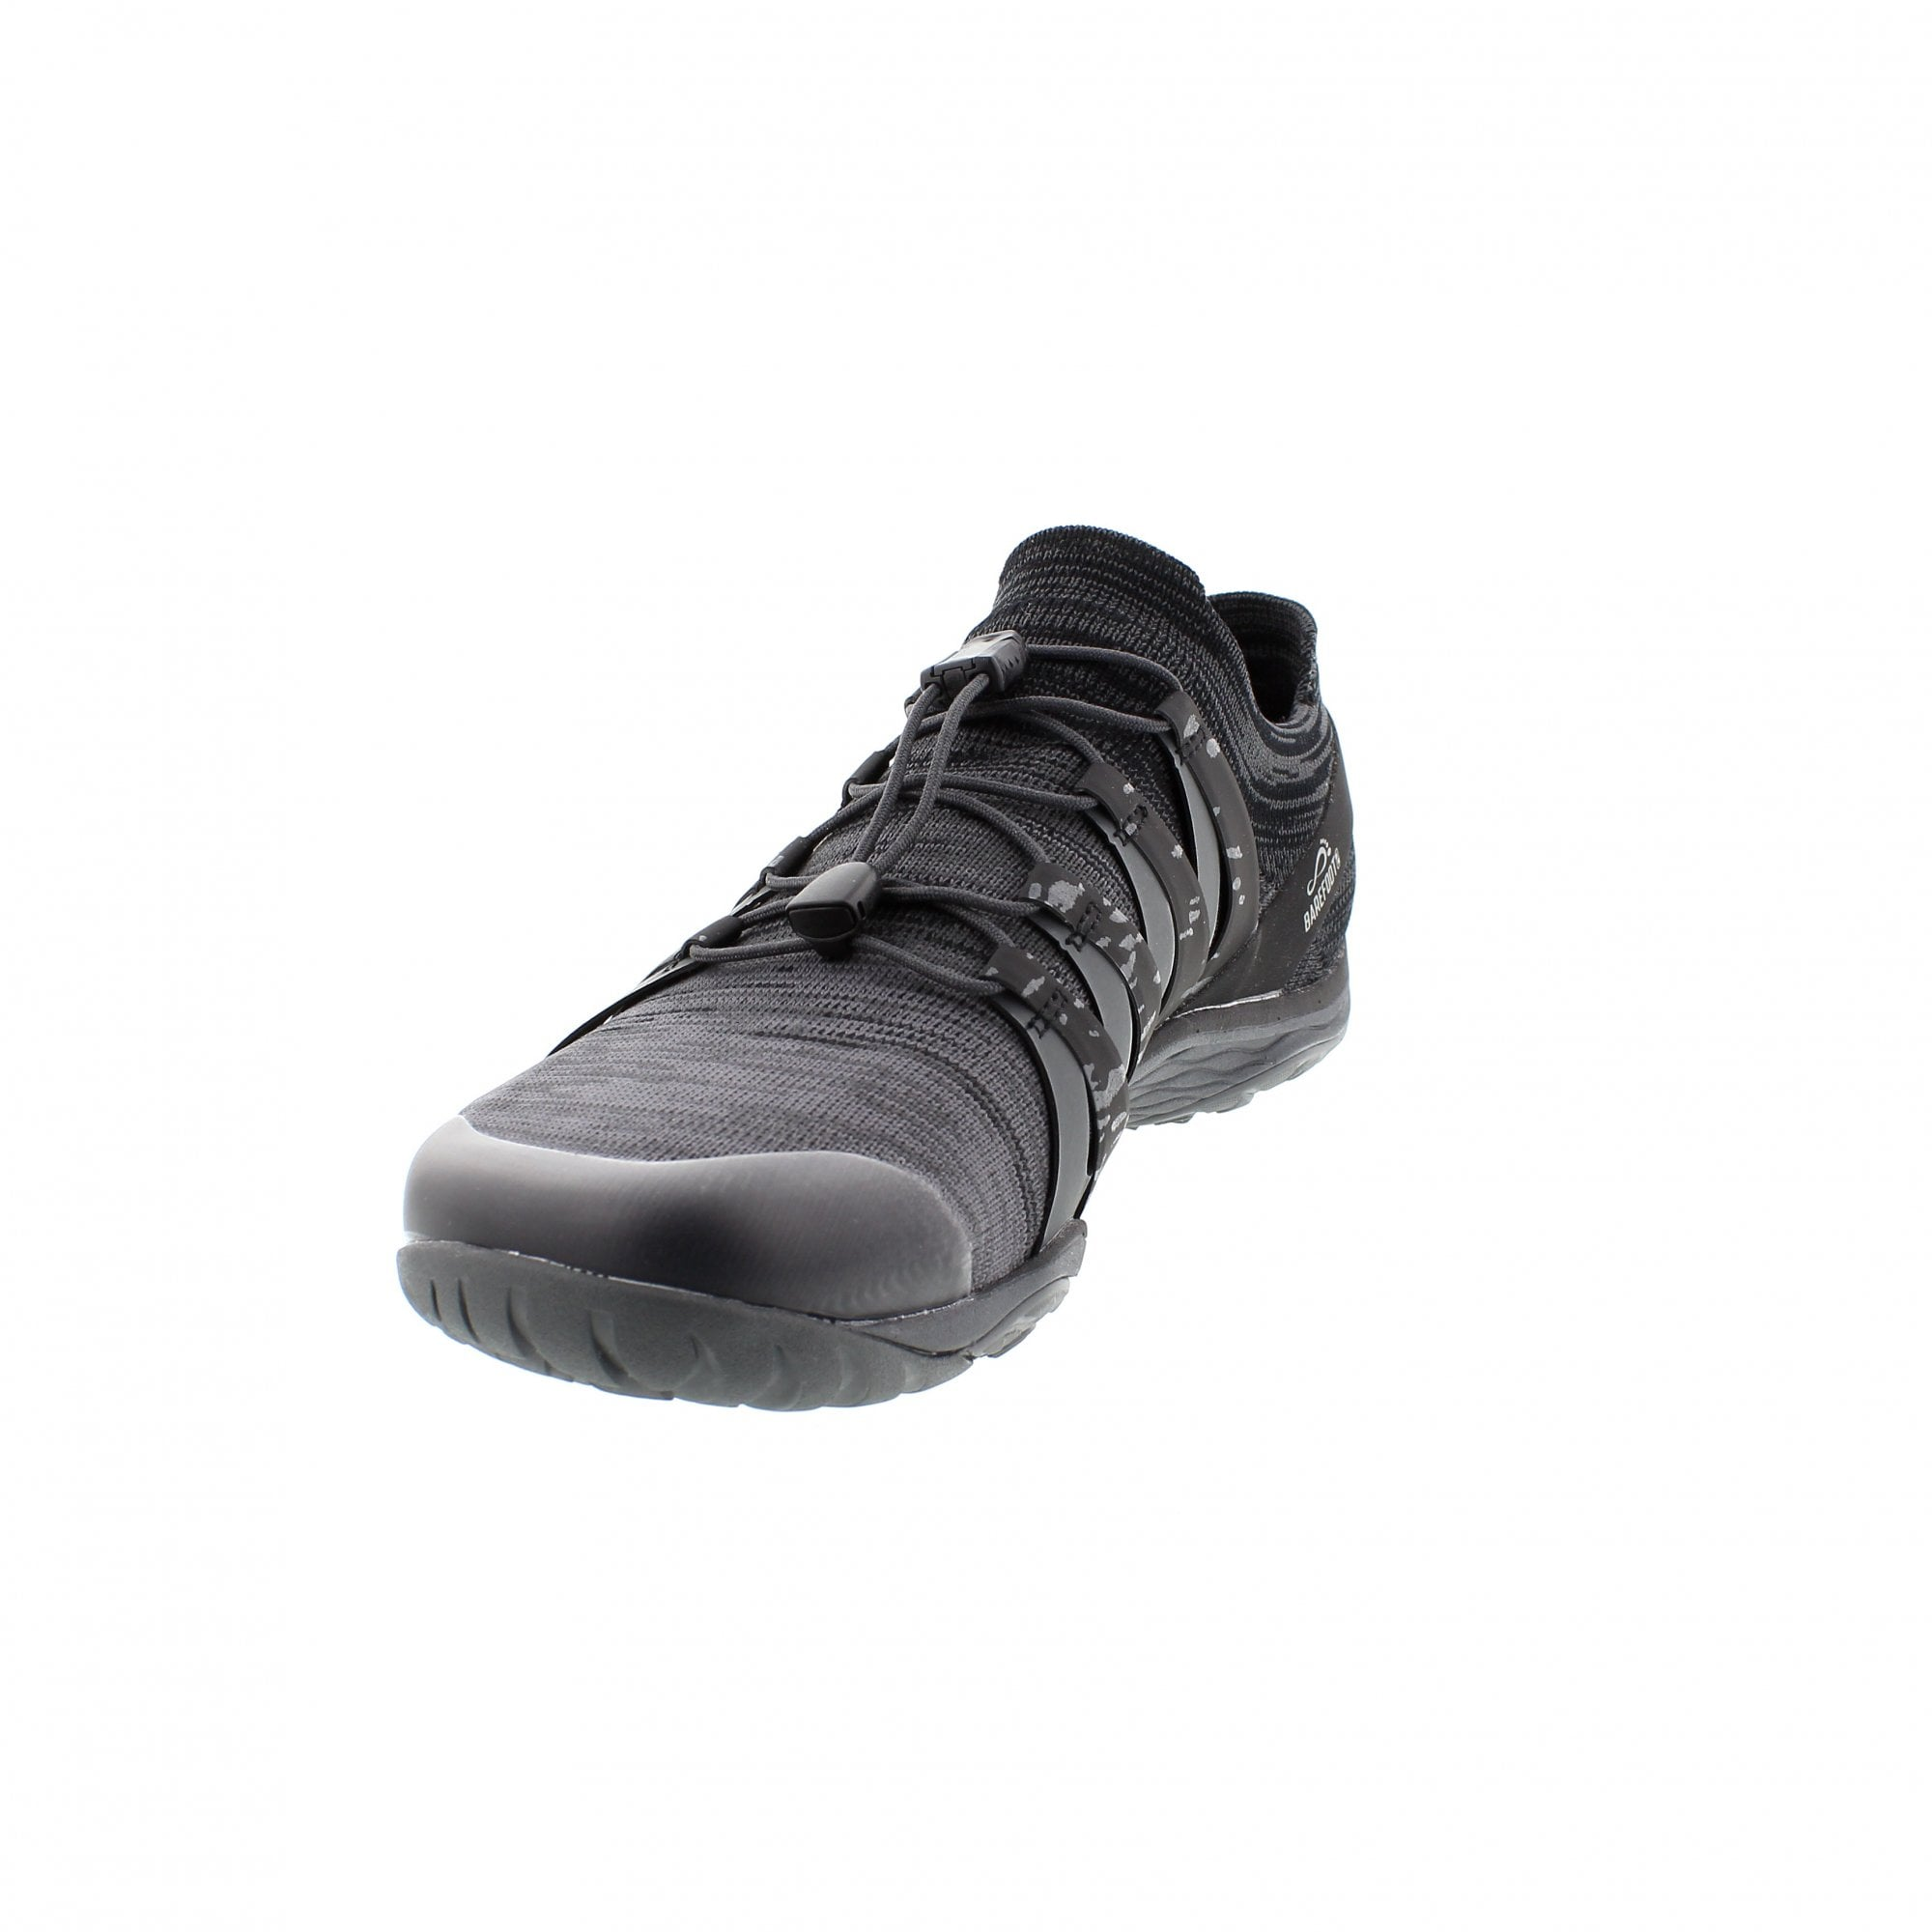 Trail Glove 5 3D | J48885